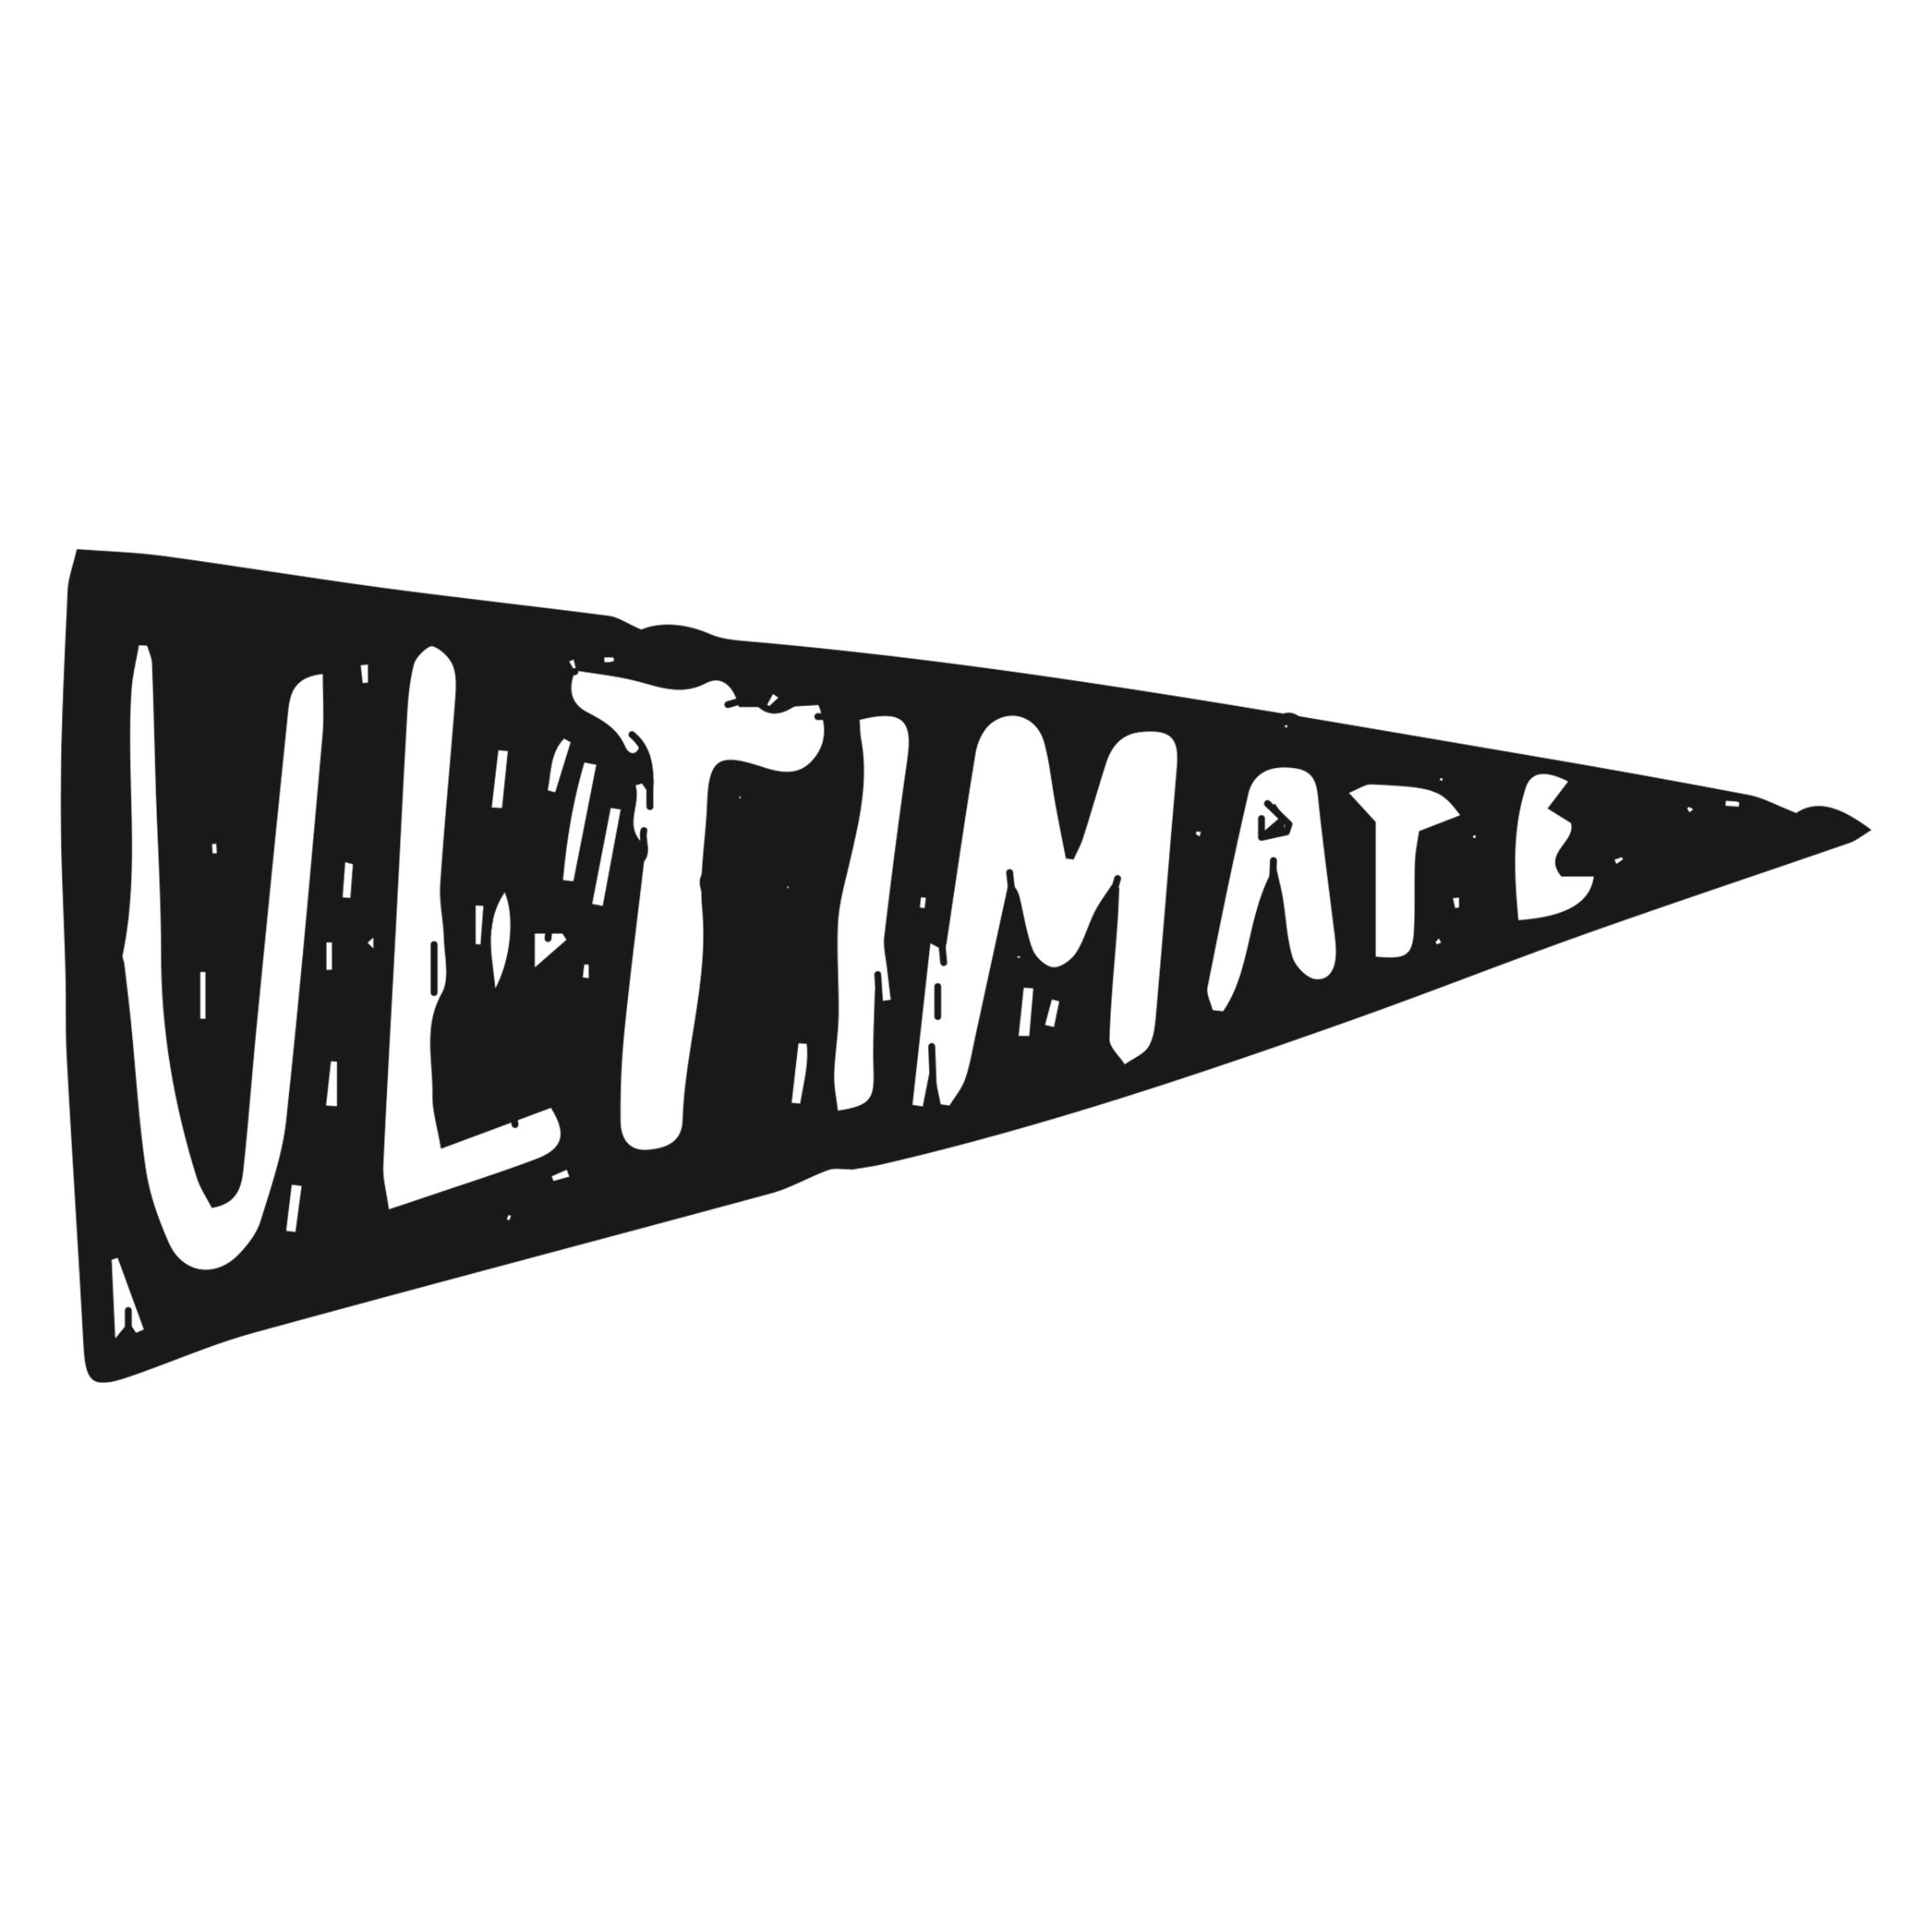 Ultimate Pennant